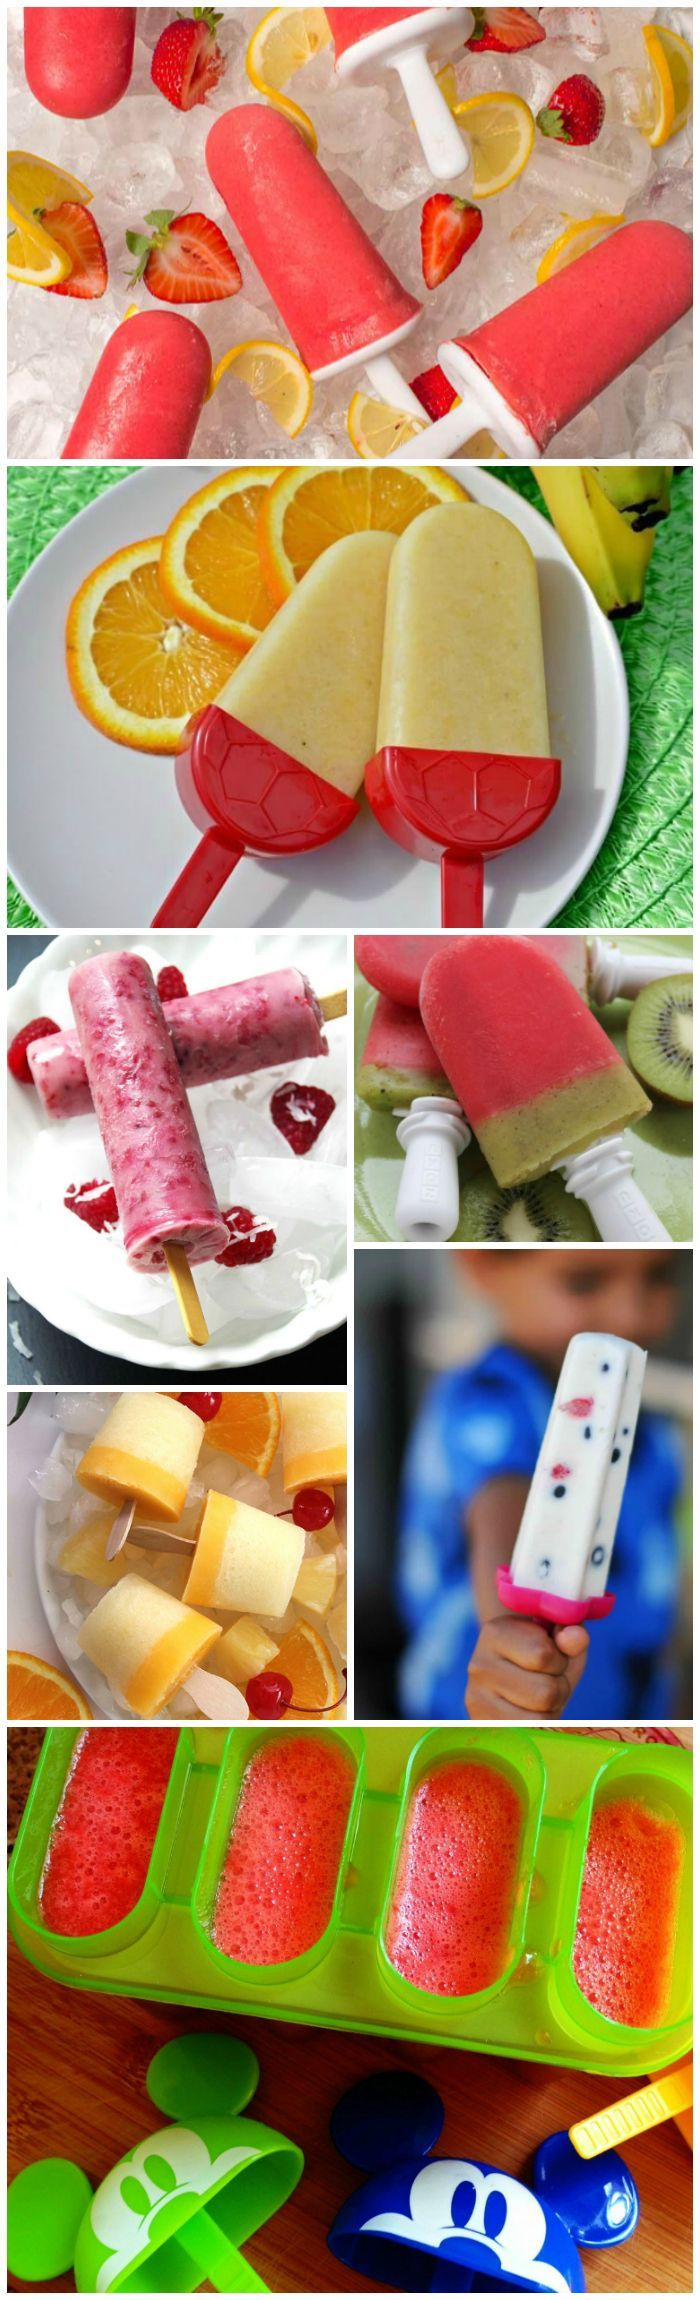 15 Homemade Fruit Popsicle Recipes